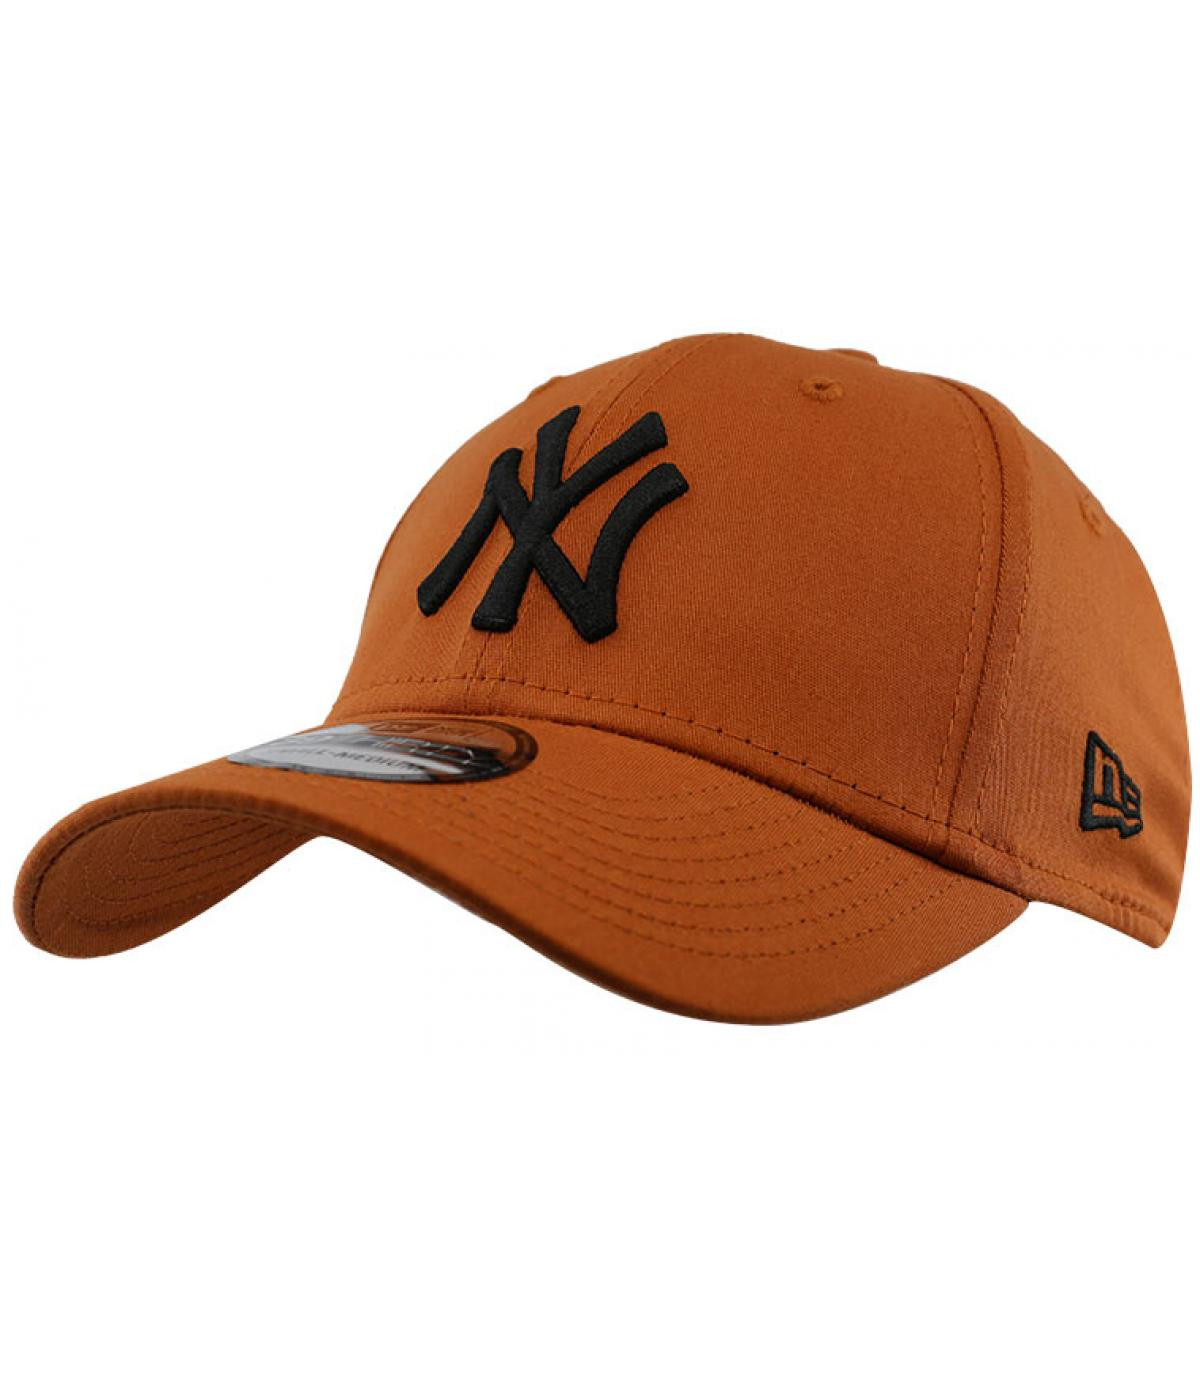 Cap NY braun schwarz